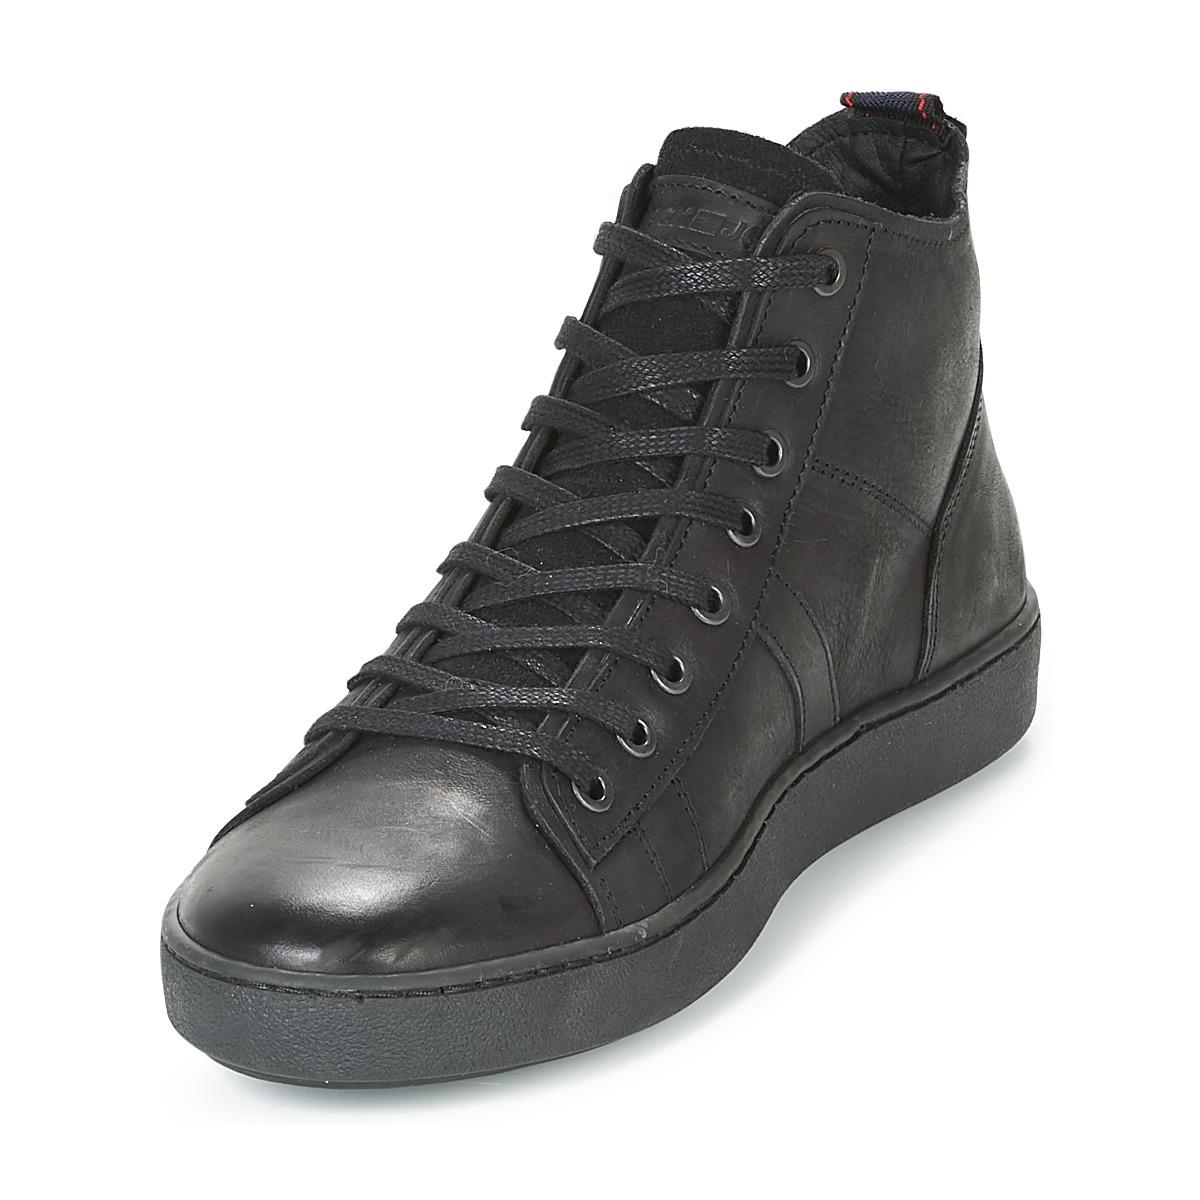 77d5669ed0 Jack & Jones Duncan Leather Ltd Men's Shoes (high-top Trainers) In ...